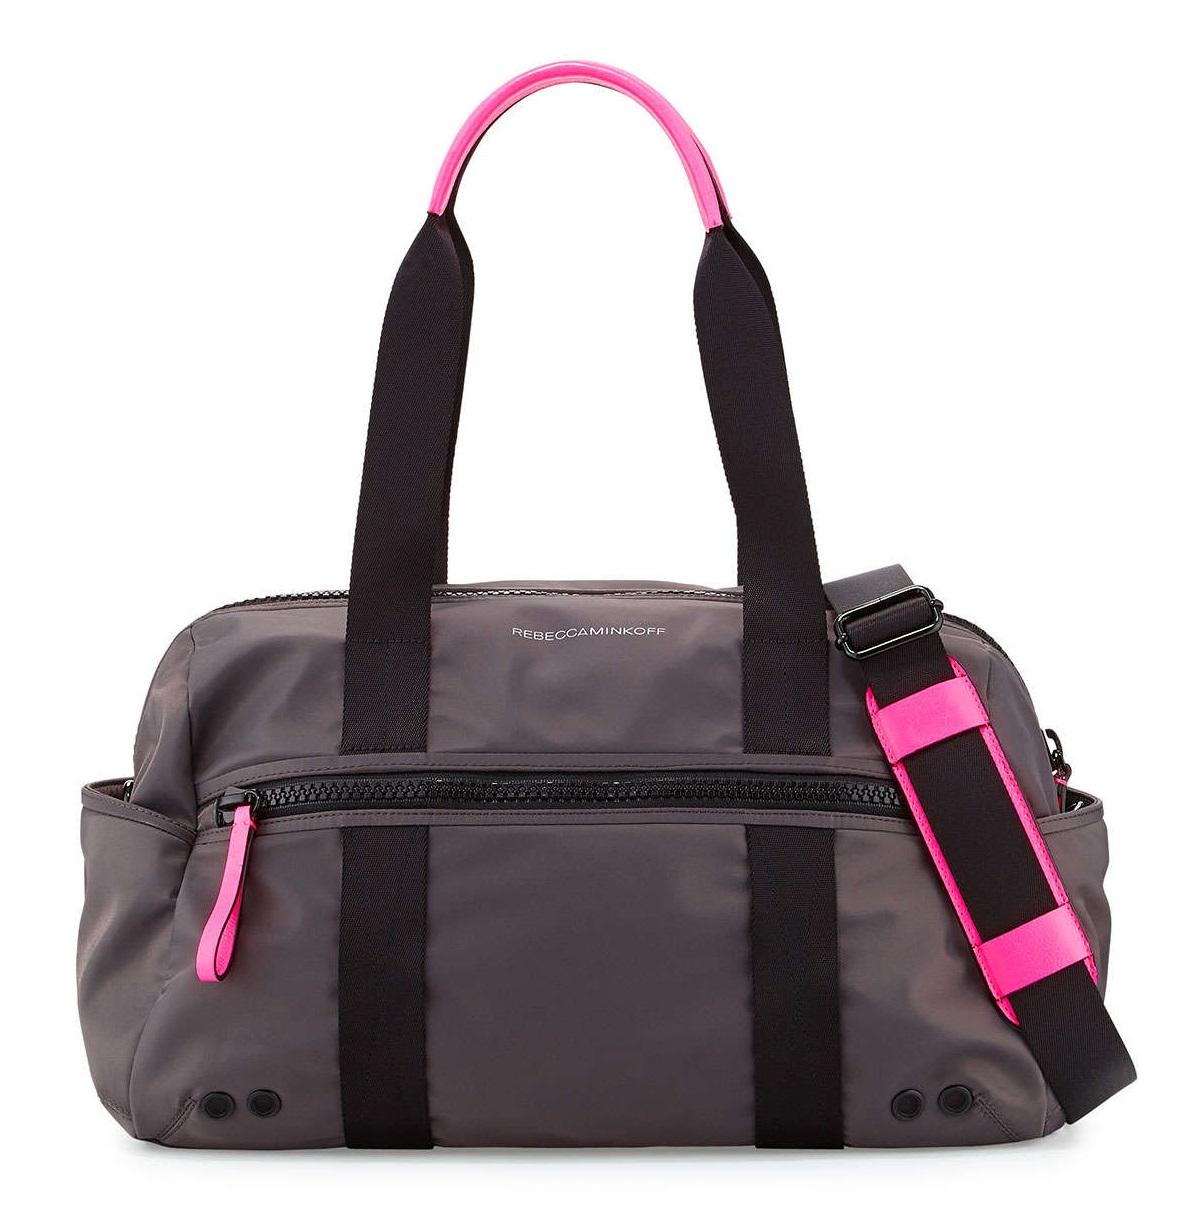 Rebecca Minkoff Yoga Carry All Duffel Bag